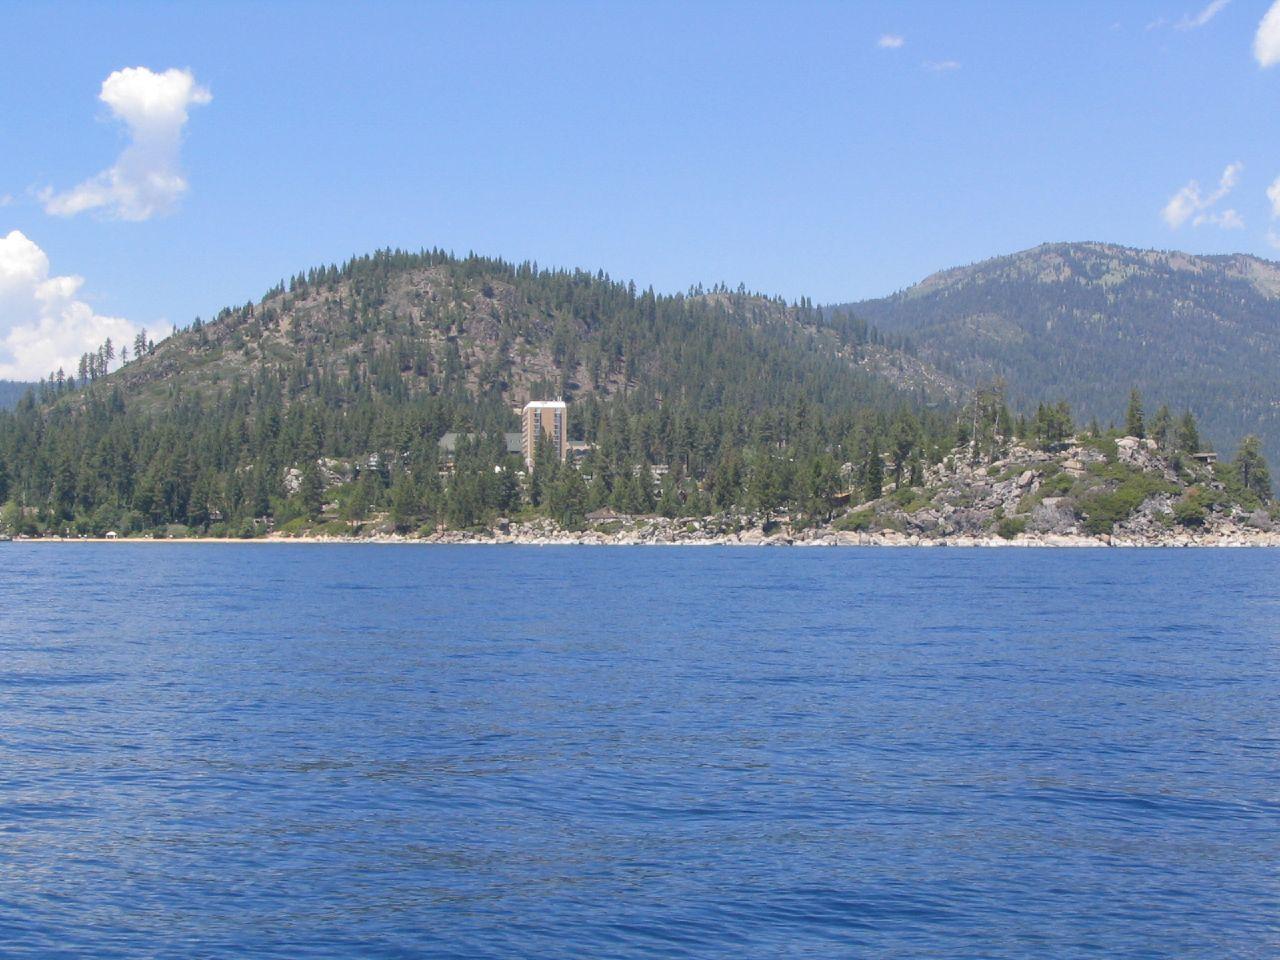 Amazing Destination in California for Road Trips-Lake Tahoe, Sierra Nevada